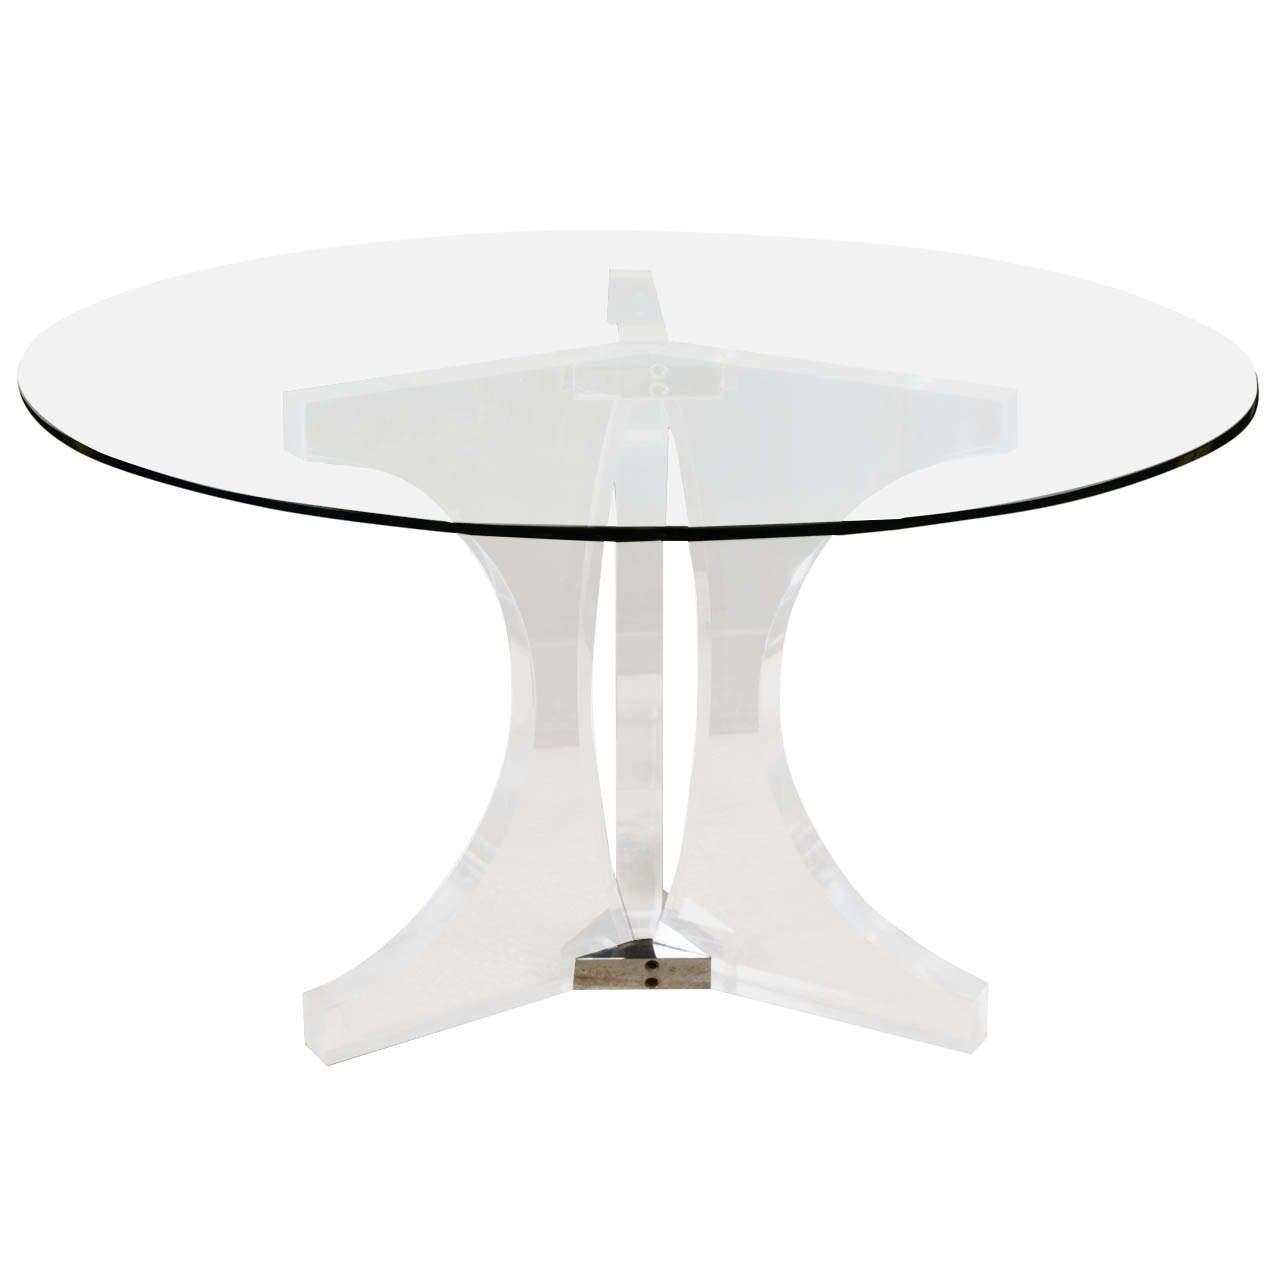 1970s Plexiglass Dining Table at 1stdibs